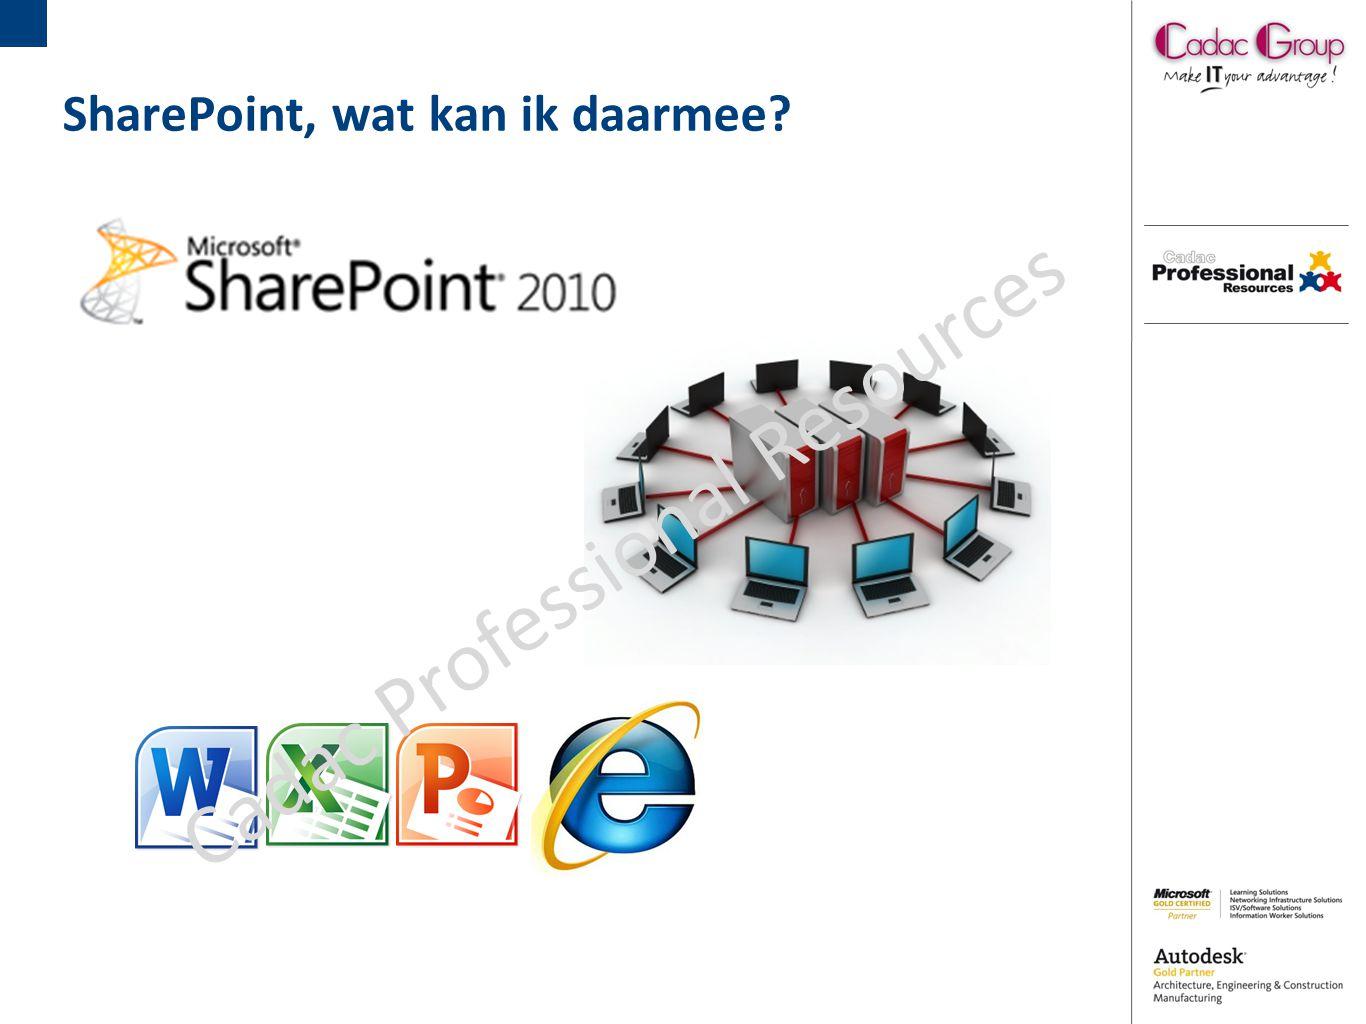 SharePoint, wat kan ik daarmee Cadac Professional Resources